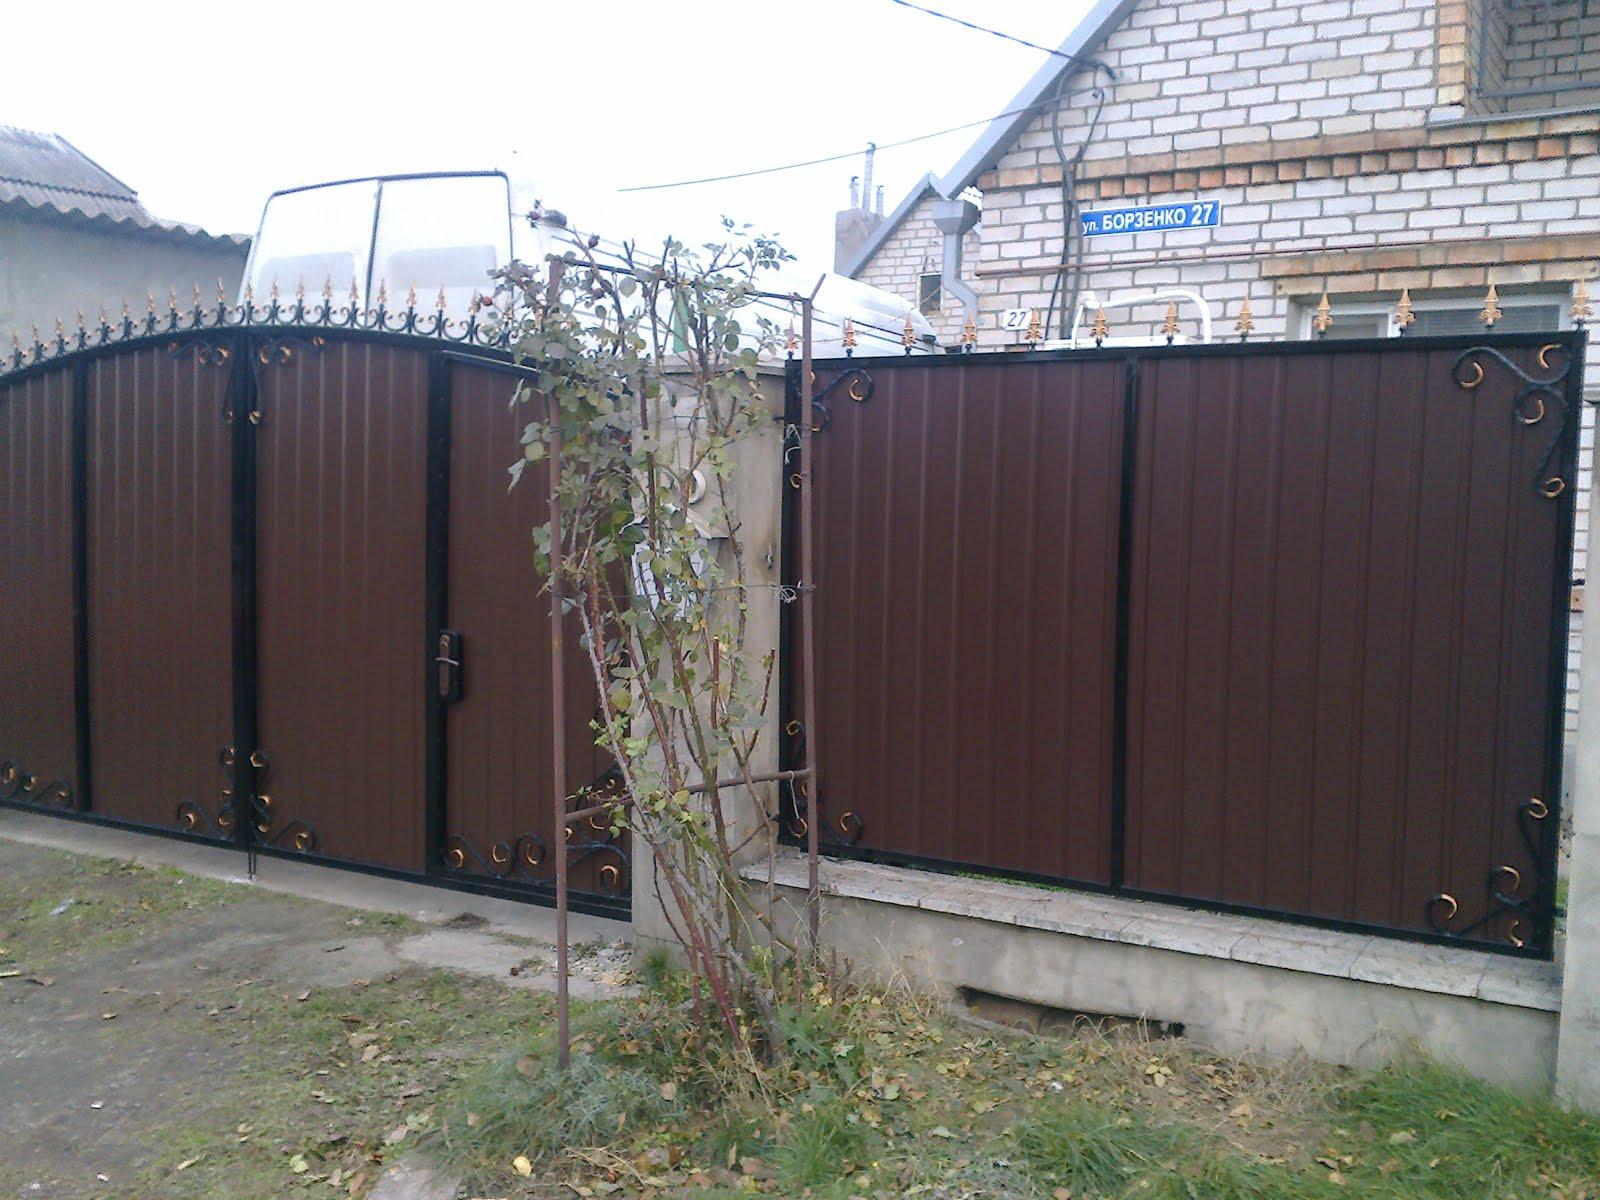 Gate - ворота заборы решетки